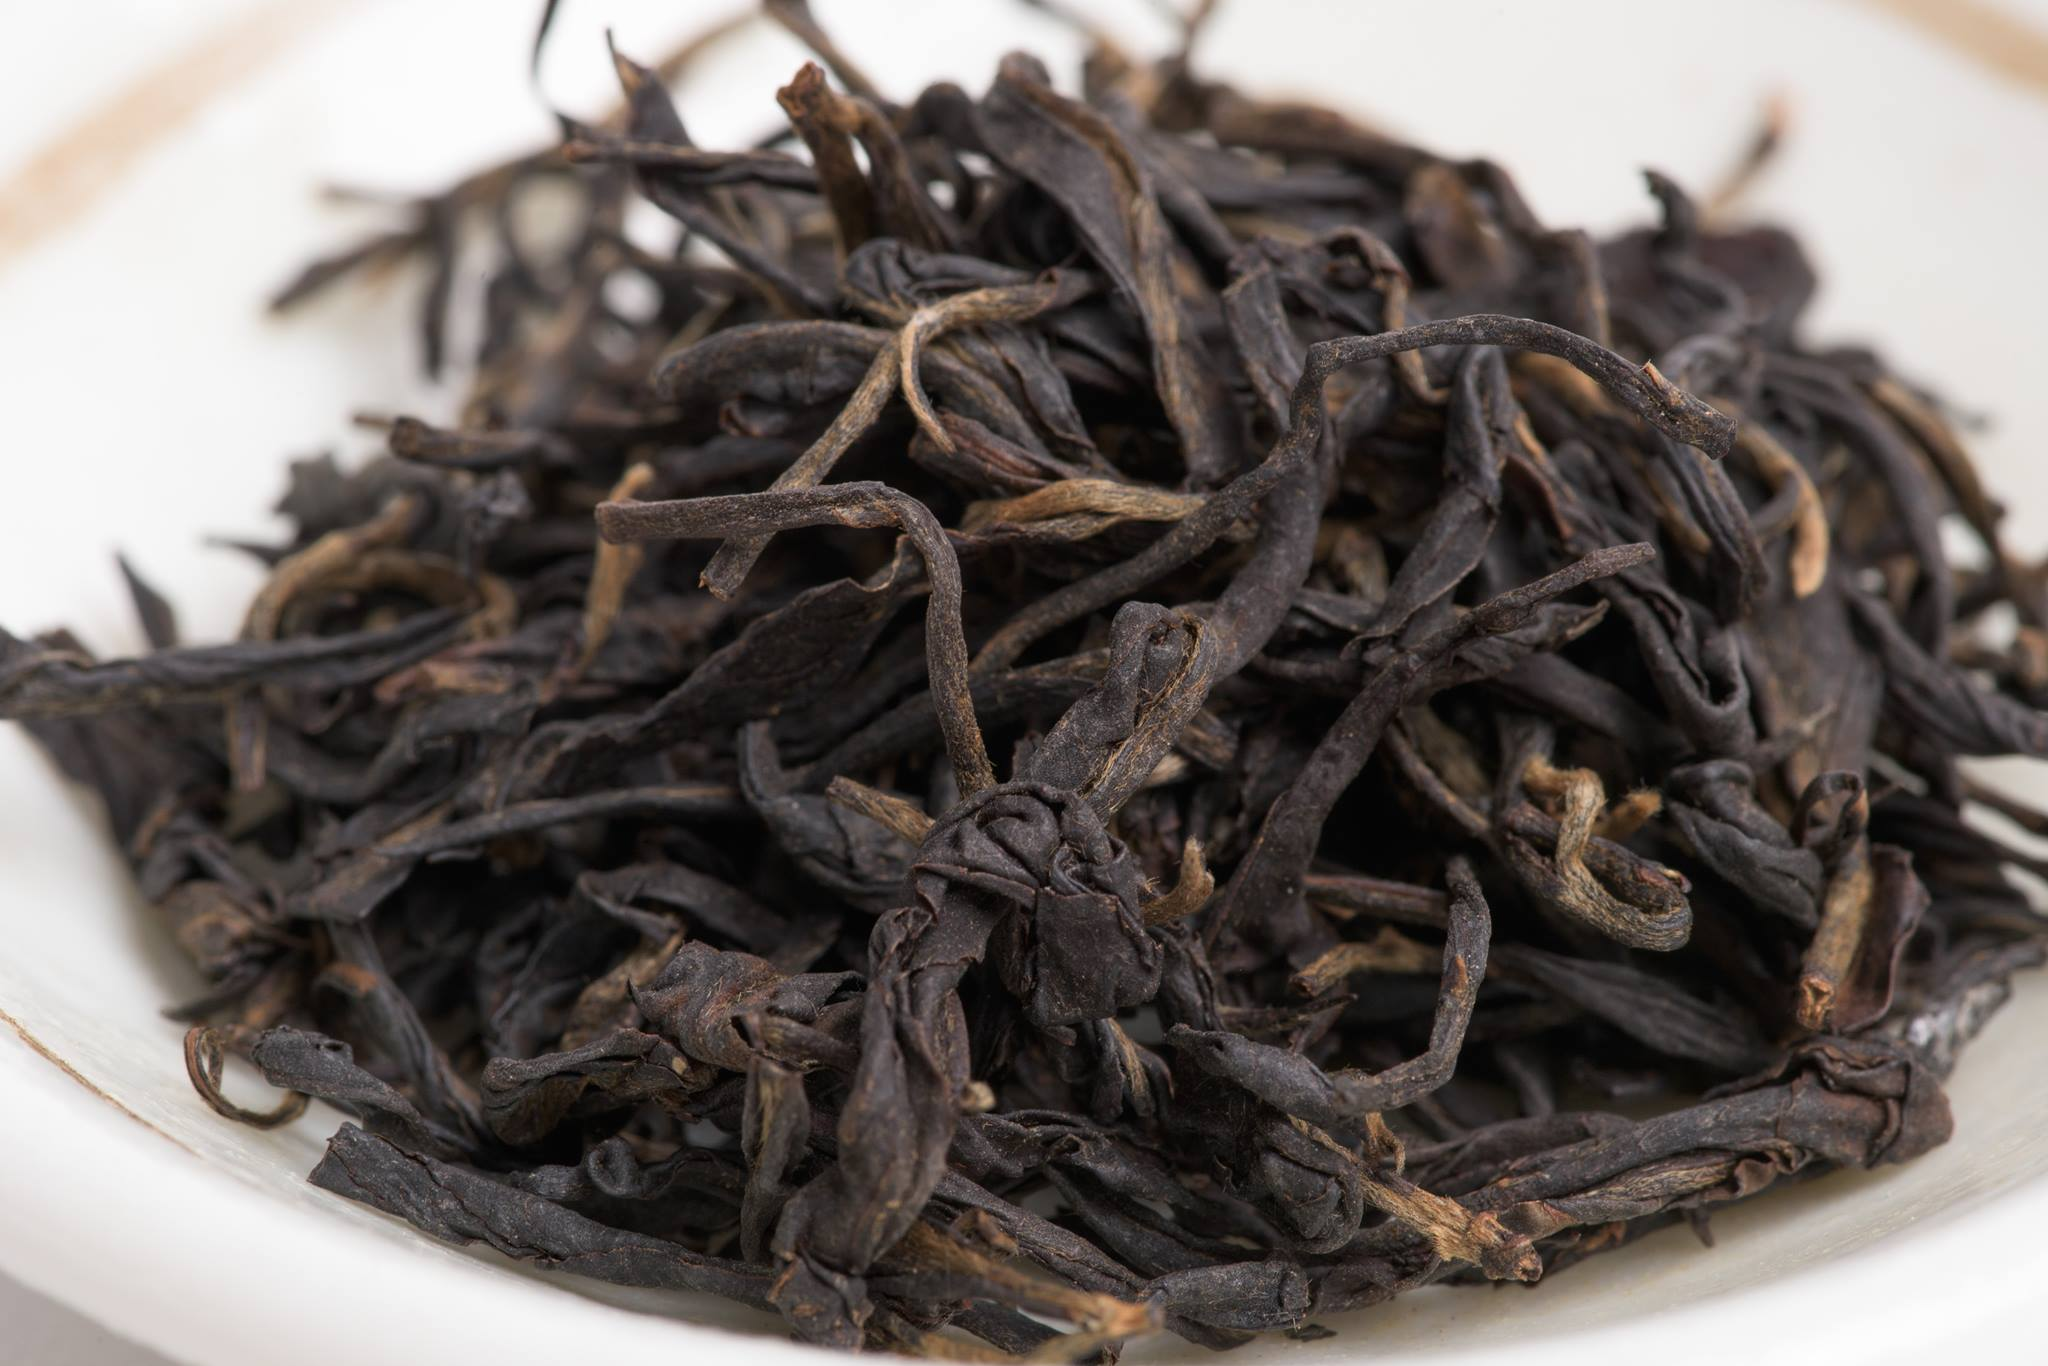 Sun Dried Black Tea from Nannuo Mountain - Photo: Guan Yin Tea House